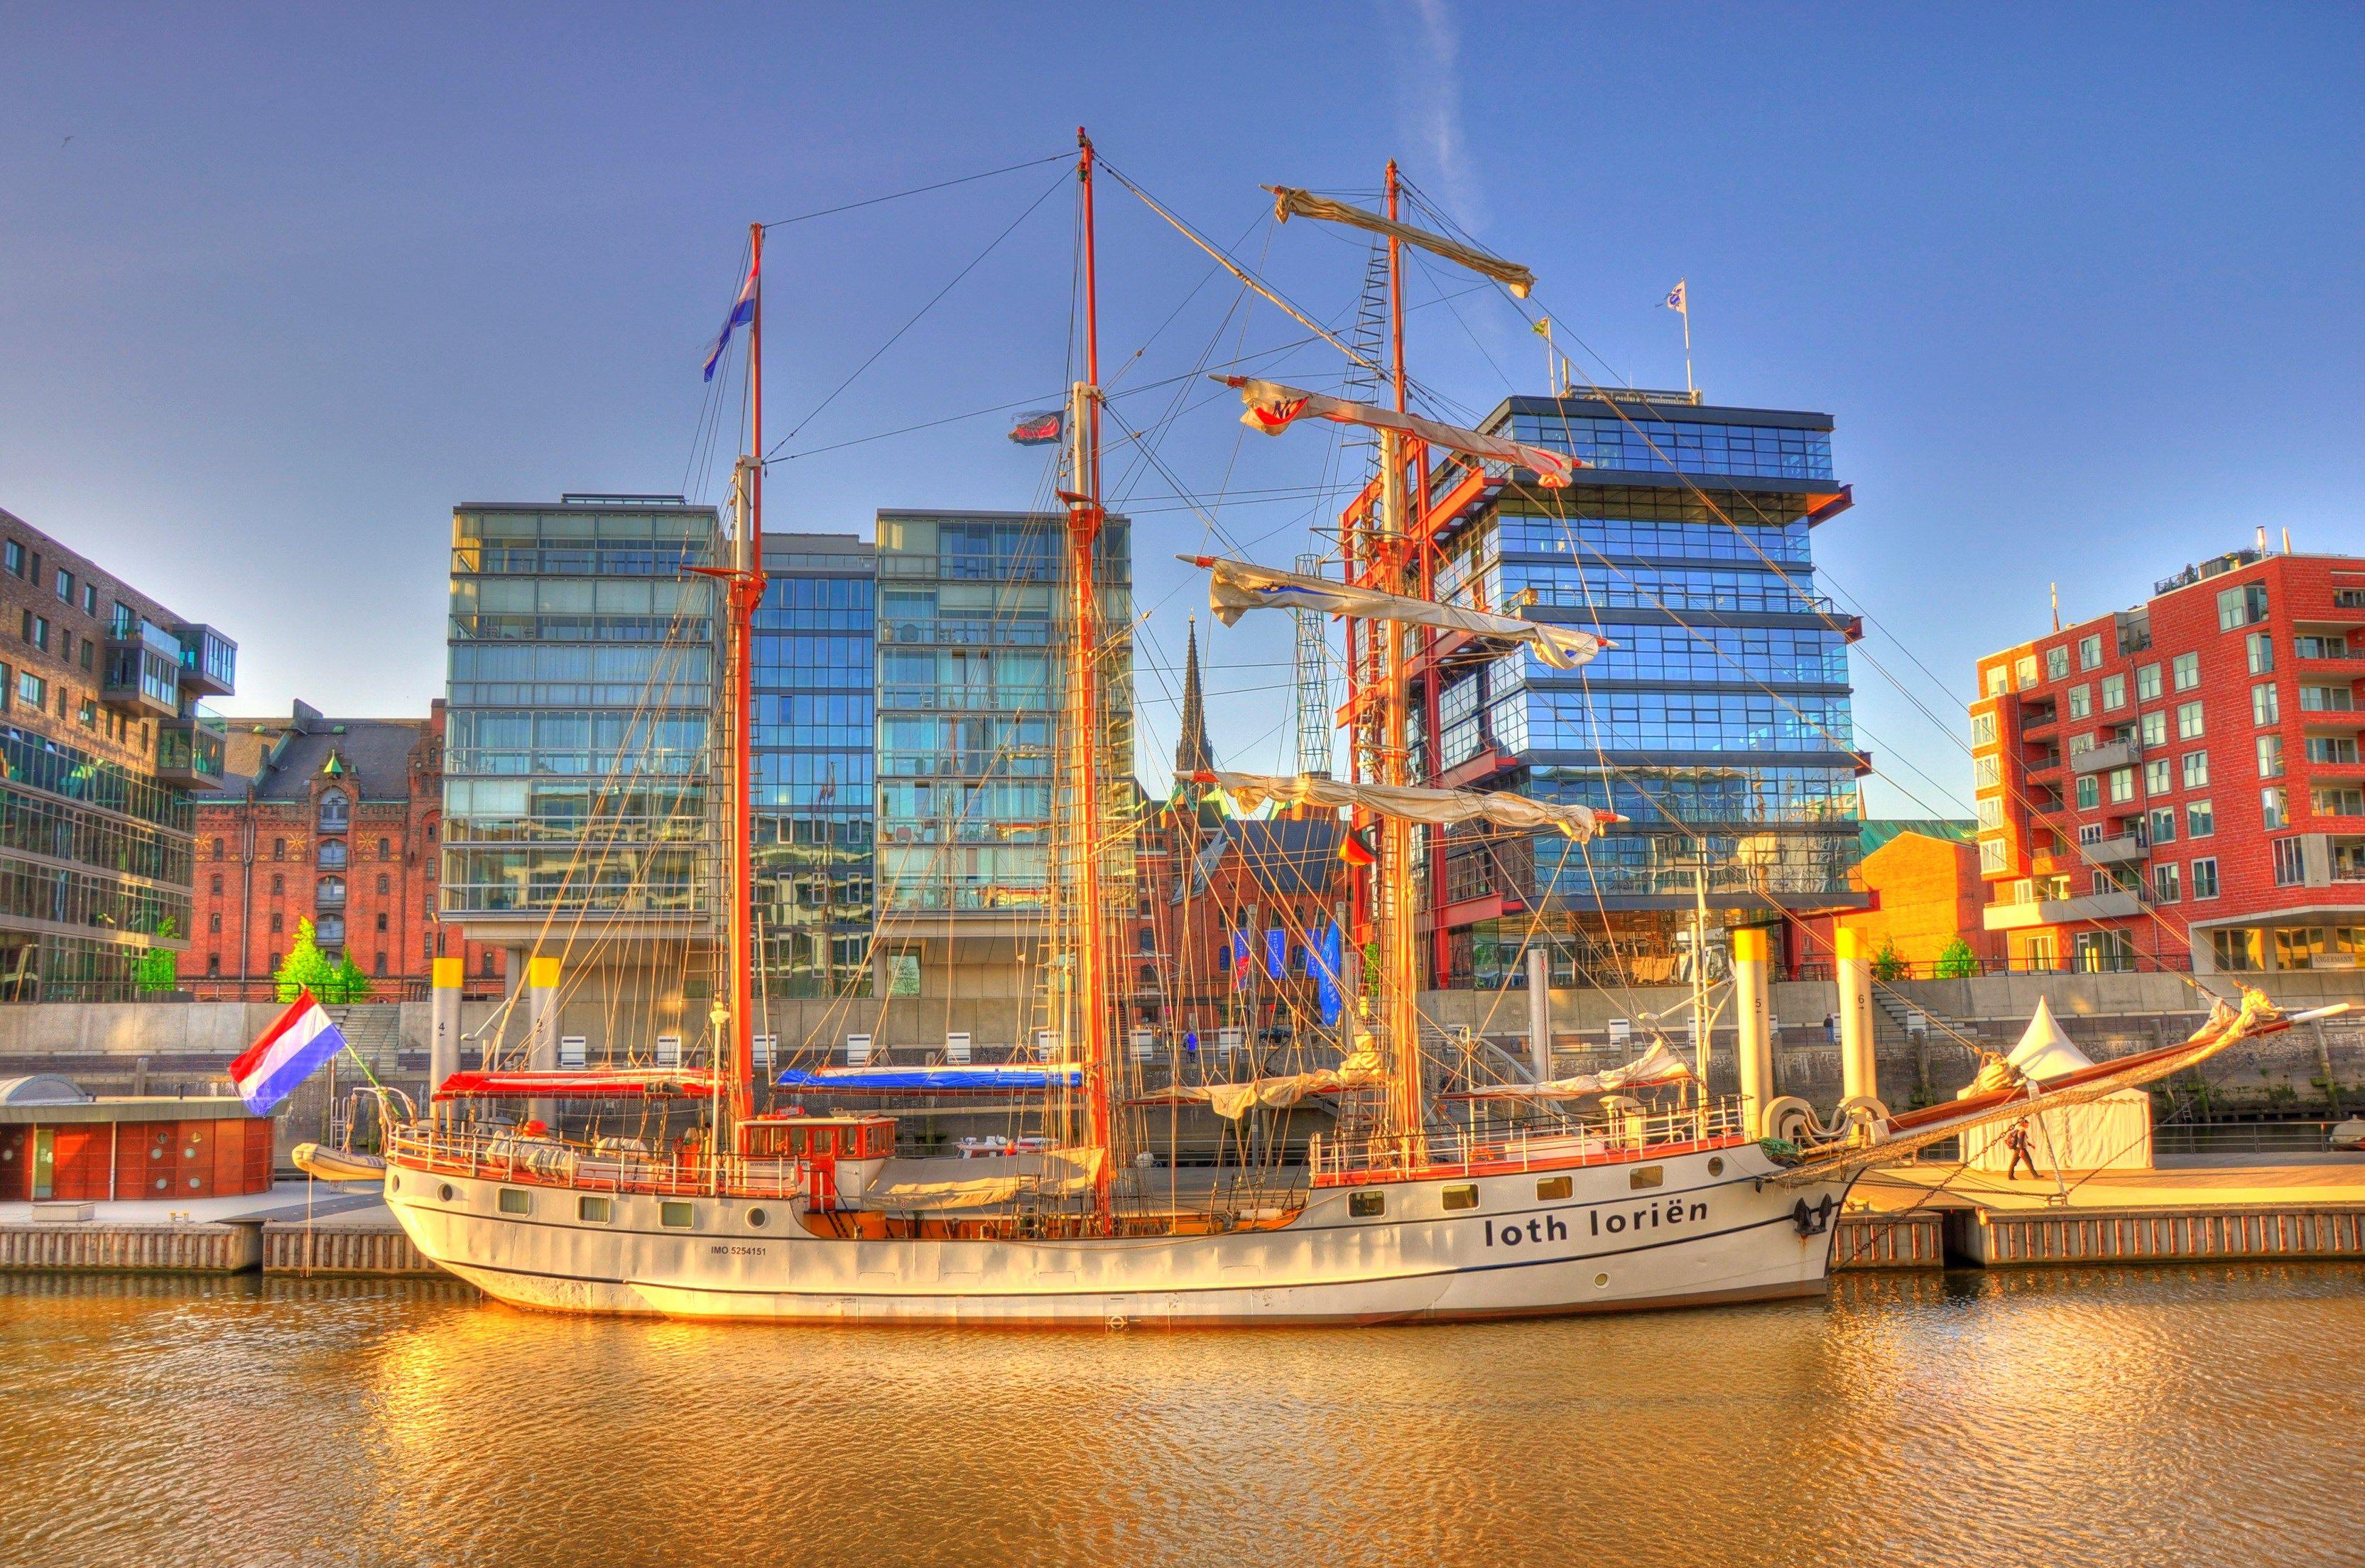 #1691594, ship category - Free ship pic